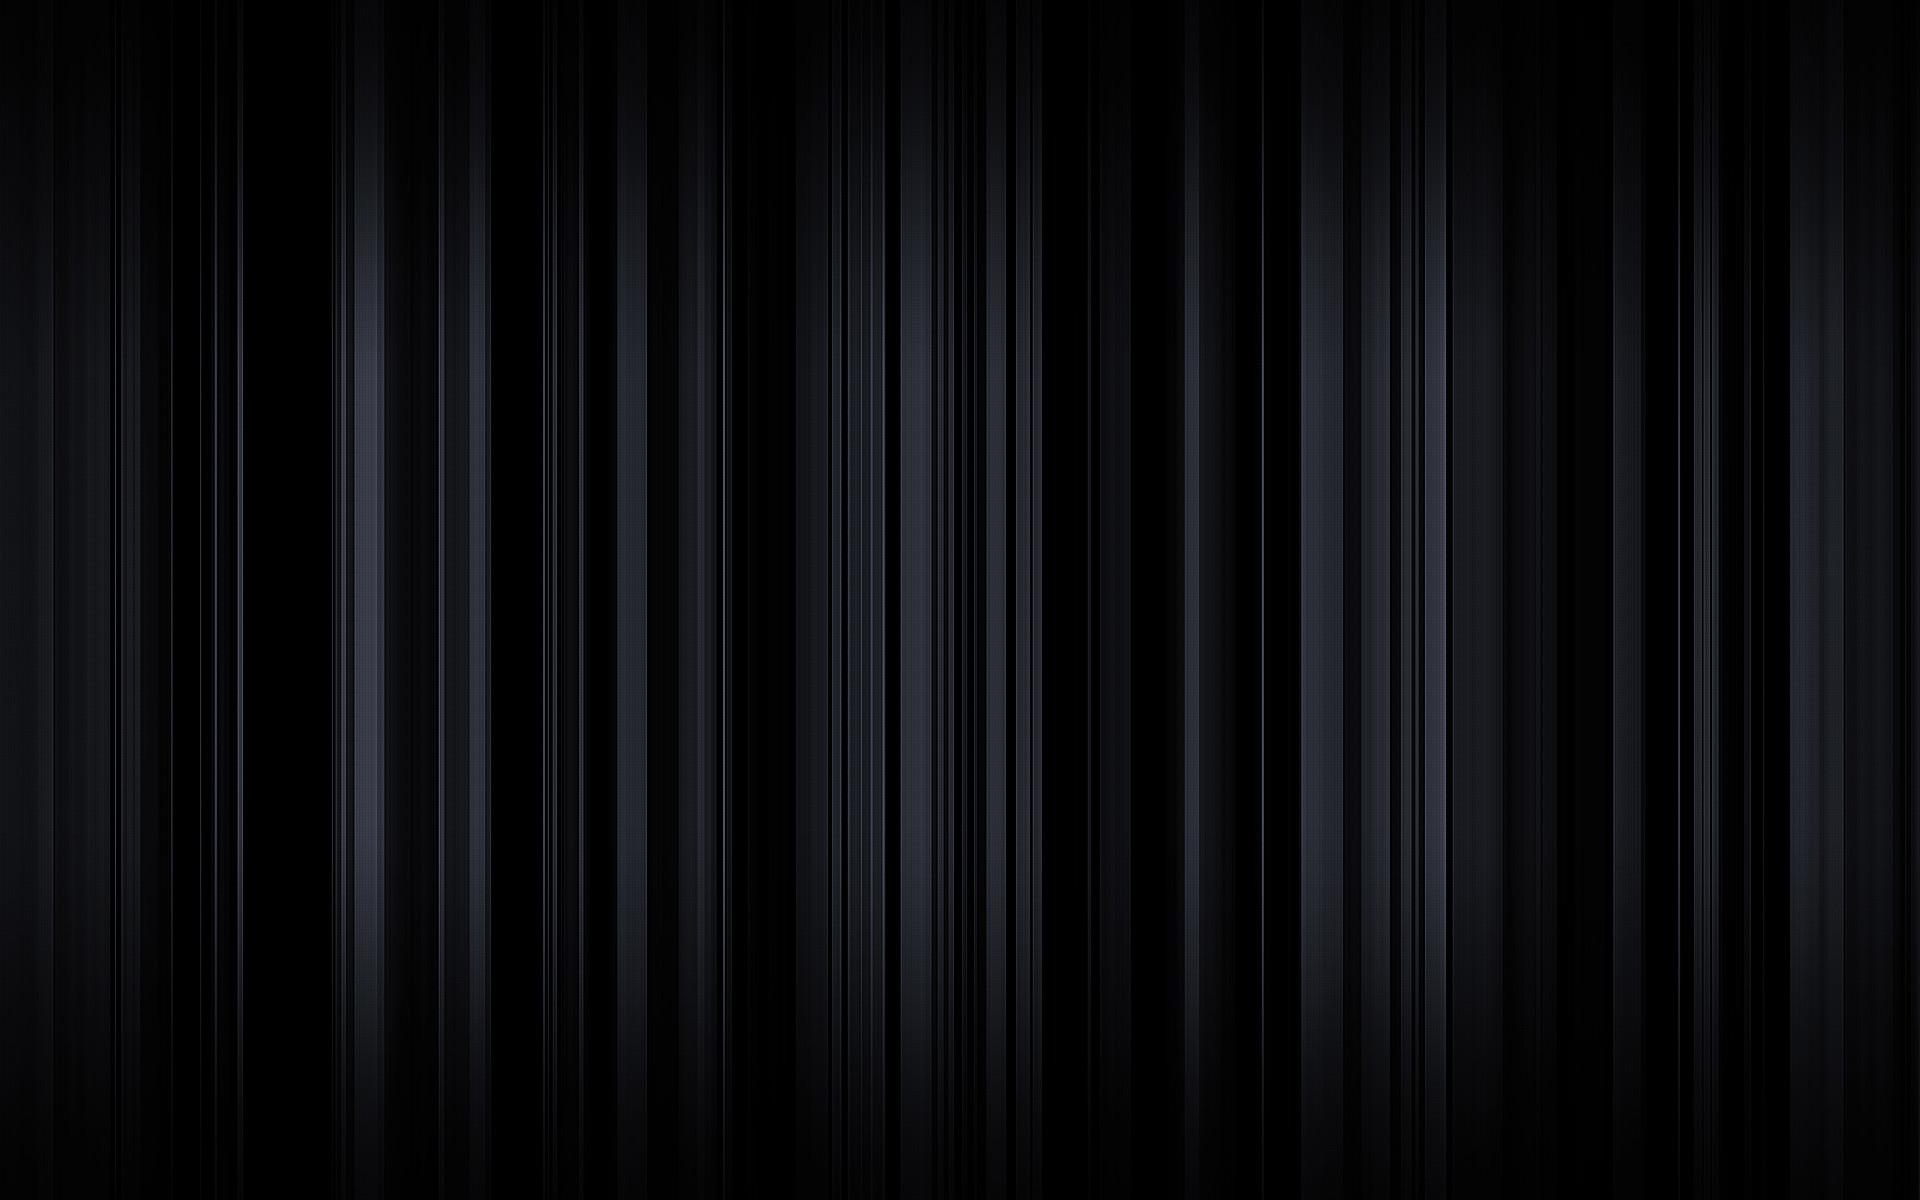 Dark Striped Wallpaper